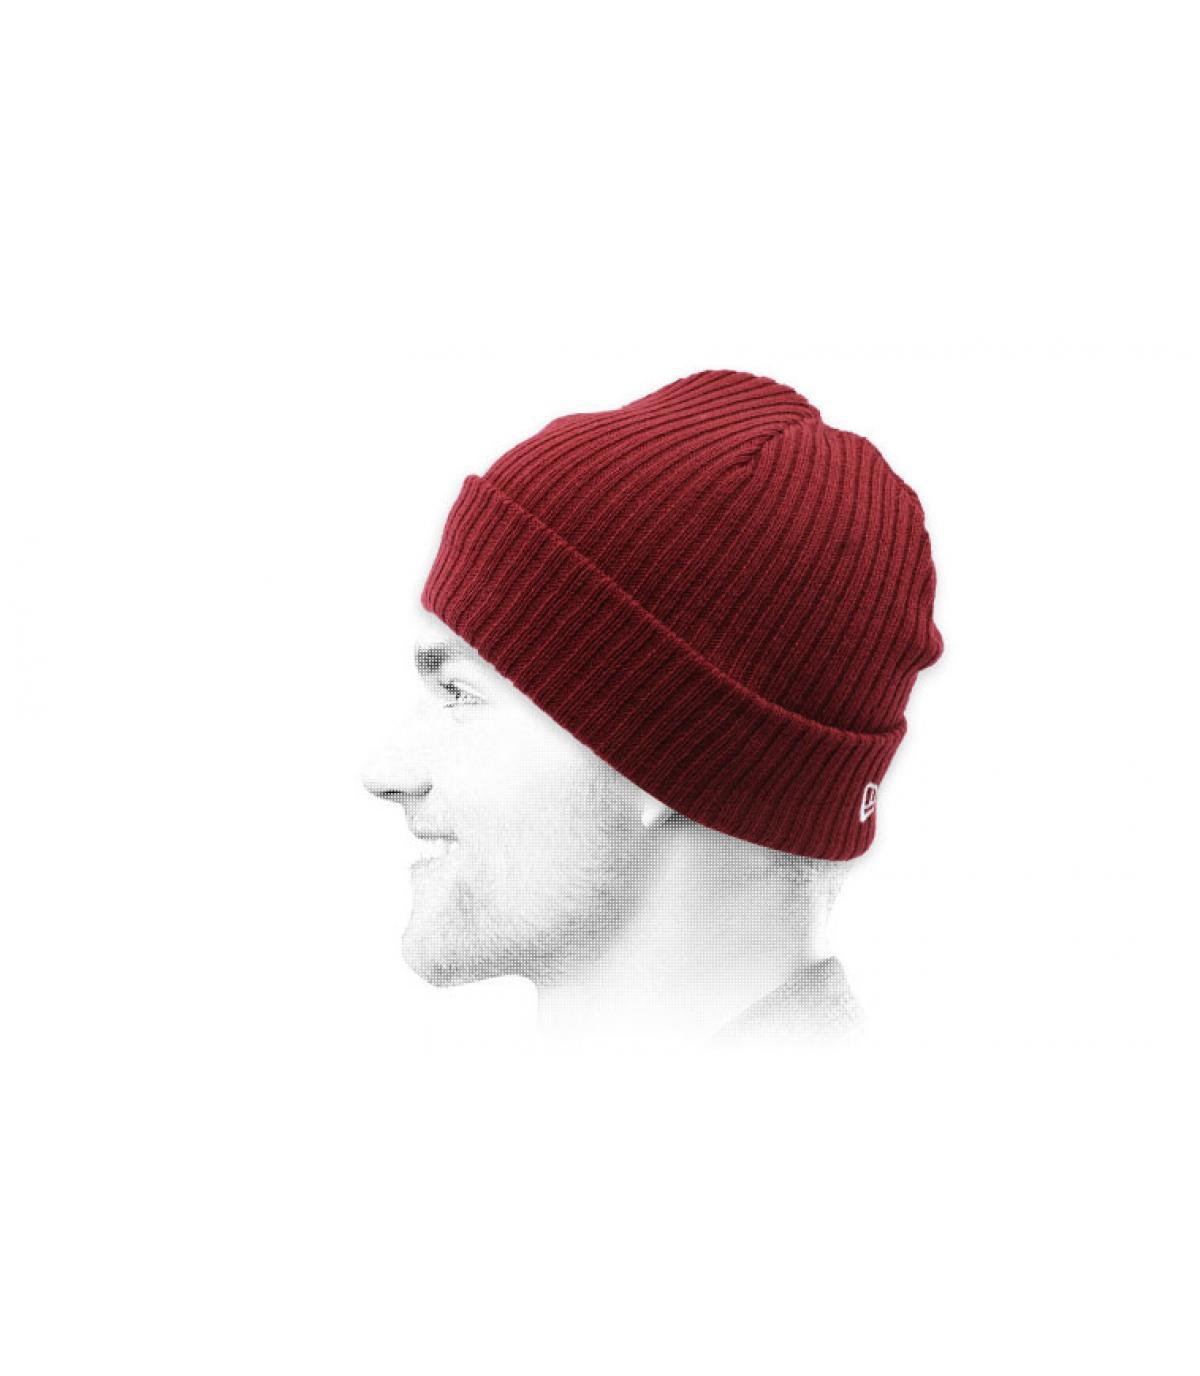 cappello docker bordeaux